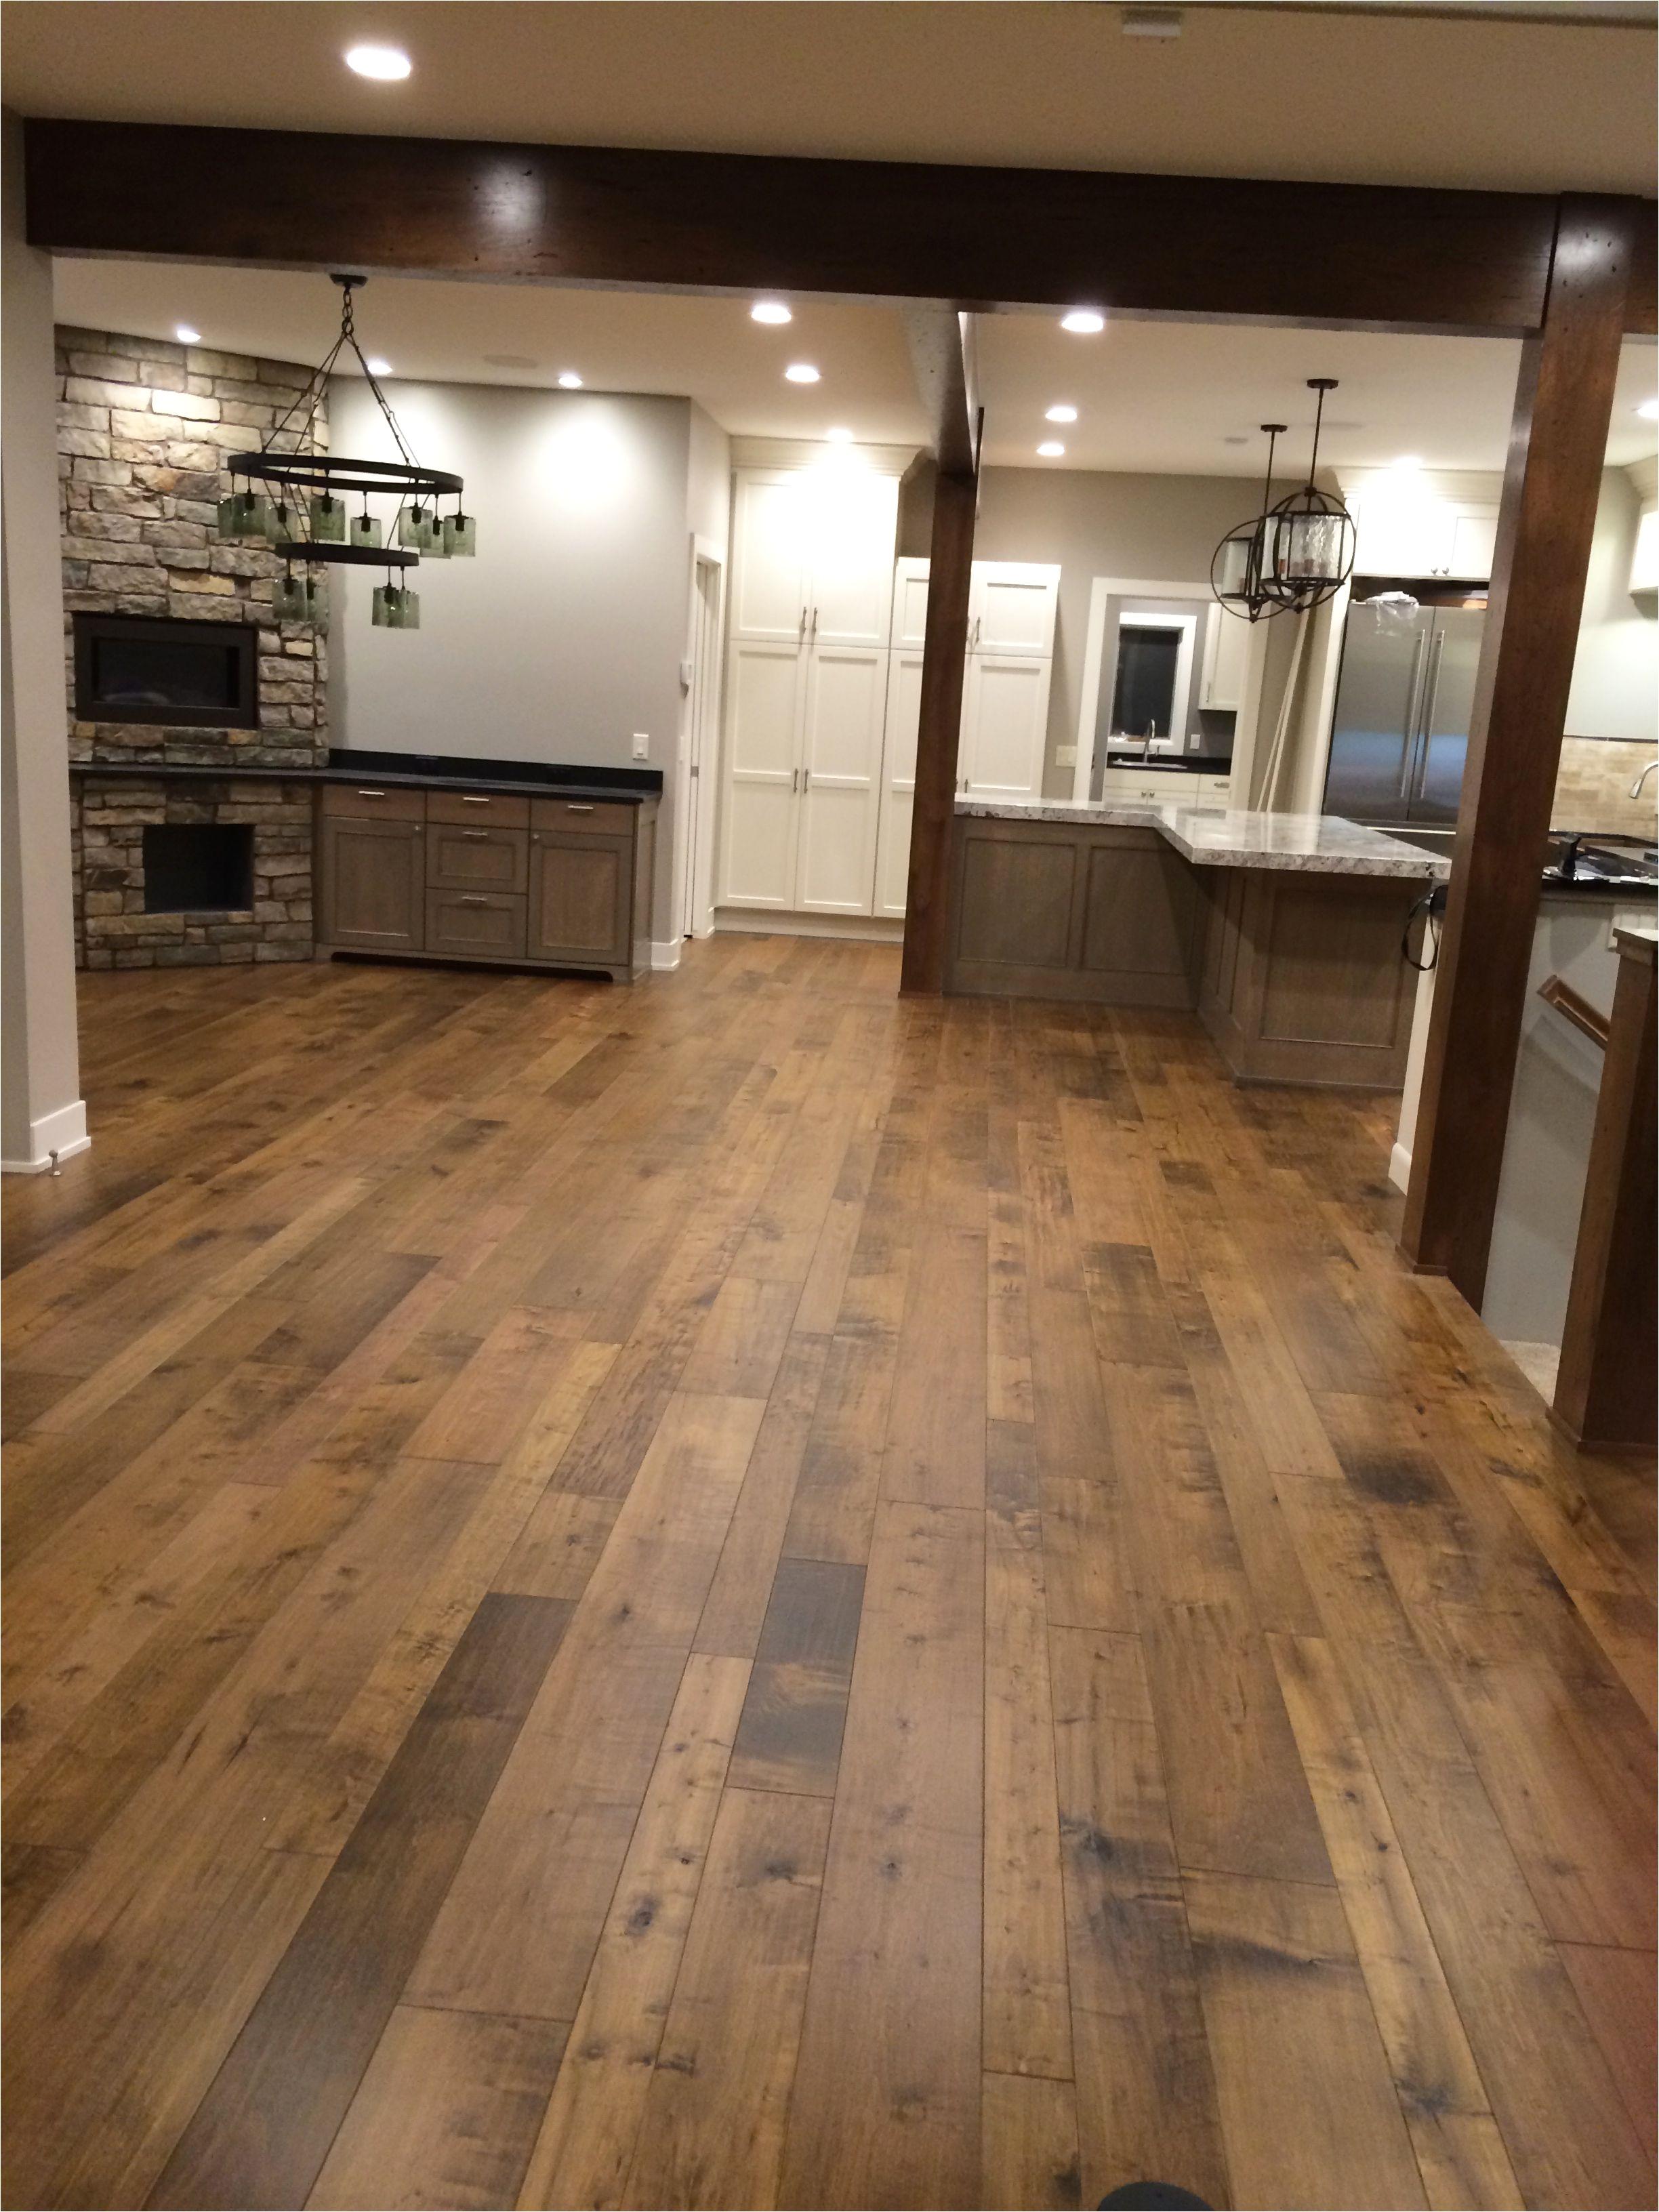 Hardwood Flooring Nashville Tn Monterey Hardwood Collection Rooms And Spaces